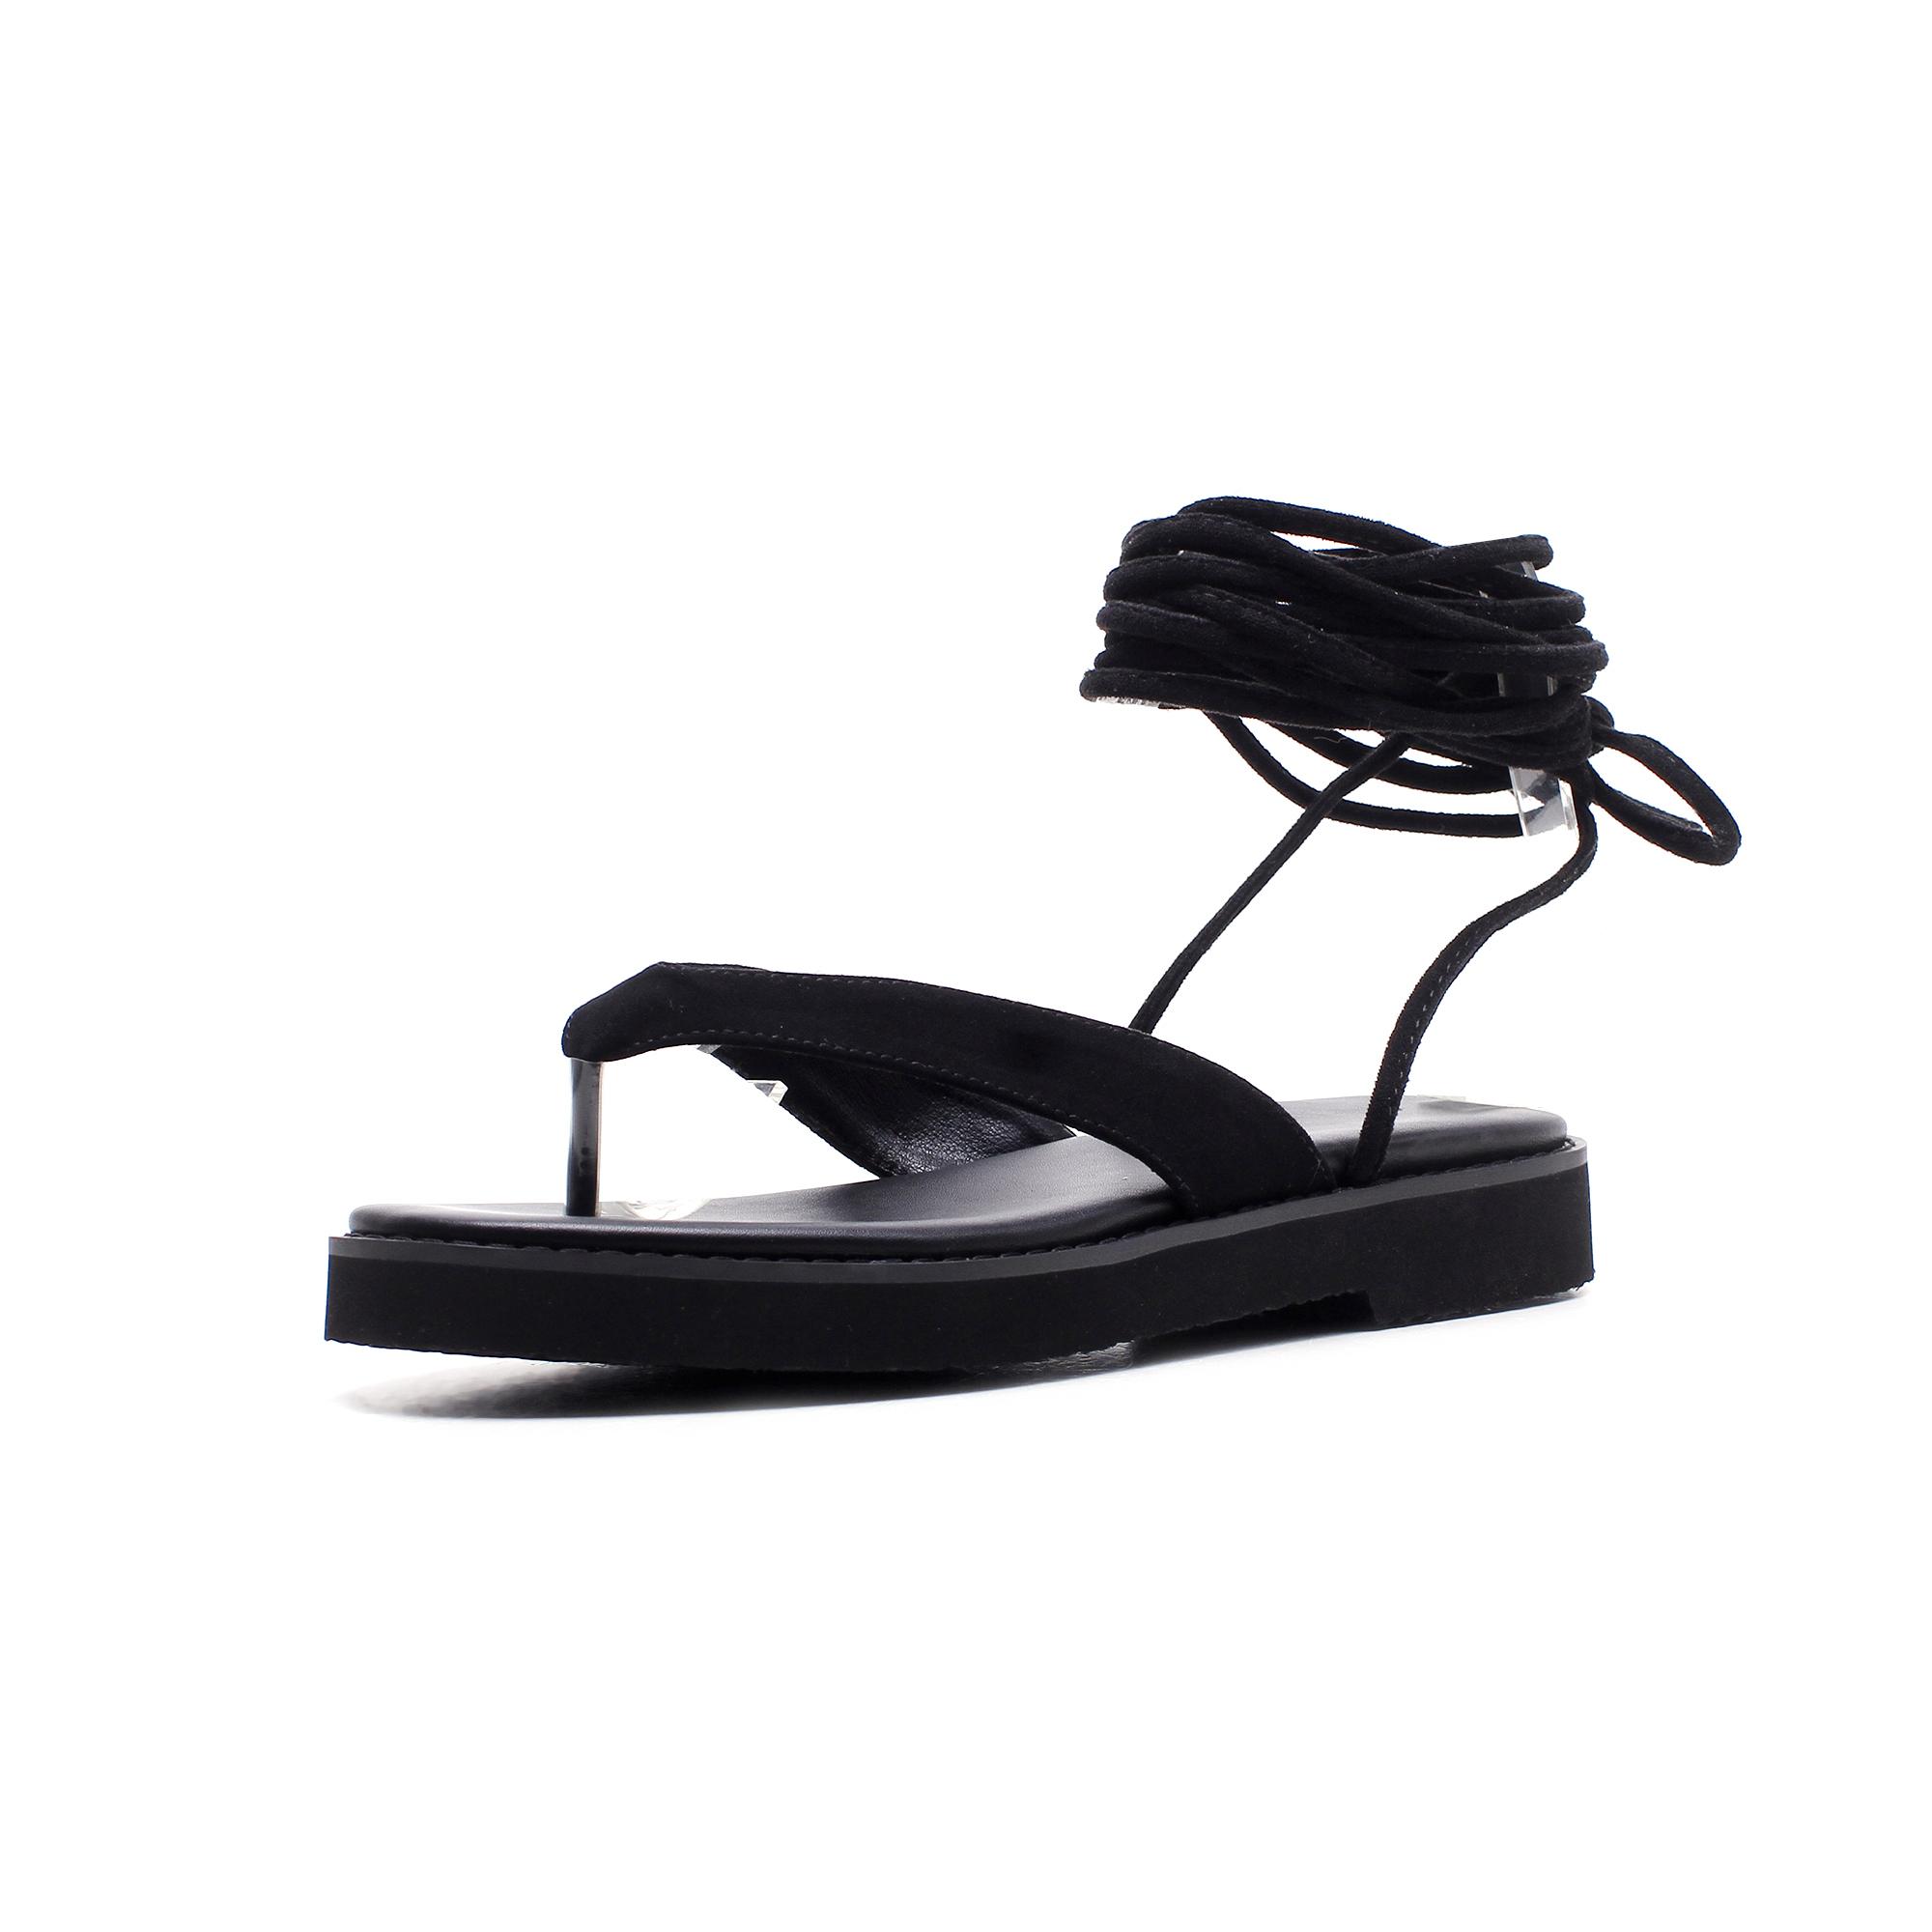 d9656dbc75748 Arden Furtado 2018 summer flats flip-flops platform fashion sandals shoes  for woman genuine suede gladiator sandals ladies shoes Item NO  GS5164